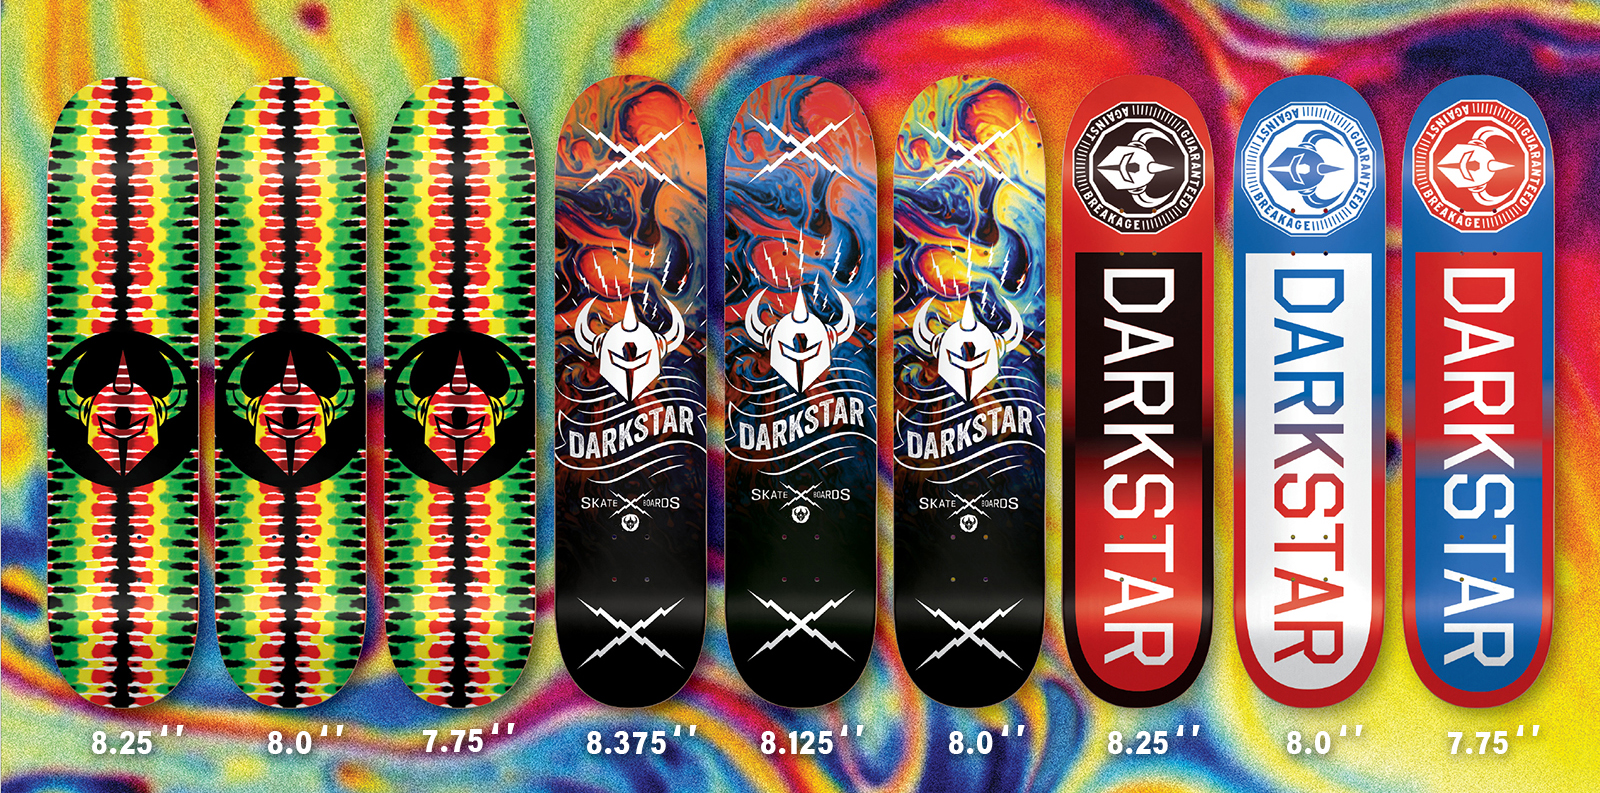 darkstar-powerdeal2